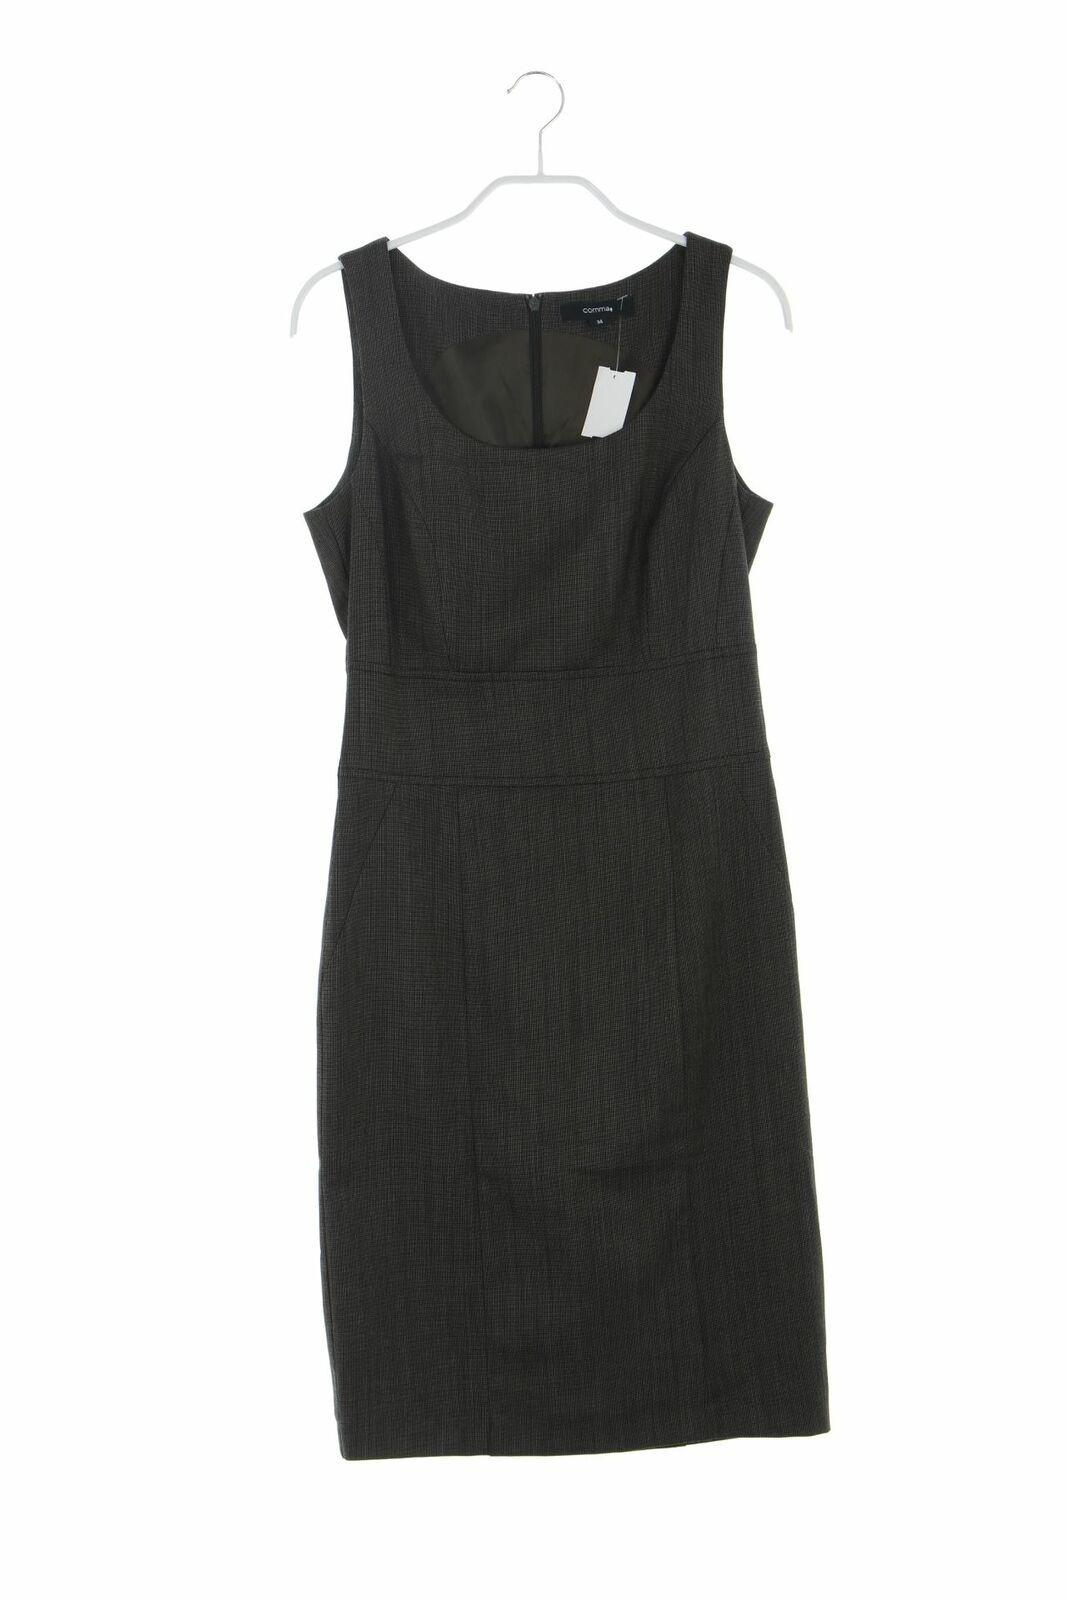 Etui-Kleid Etui Viskose Schlitz Damen D 11 Dress eng Braun-Töne